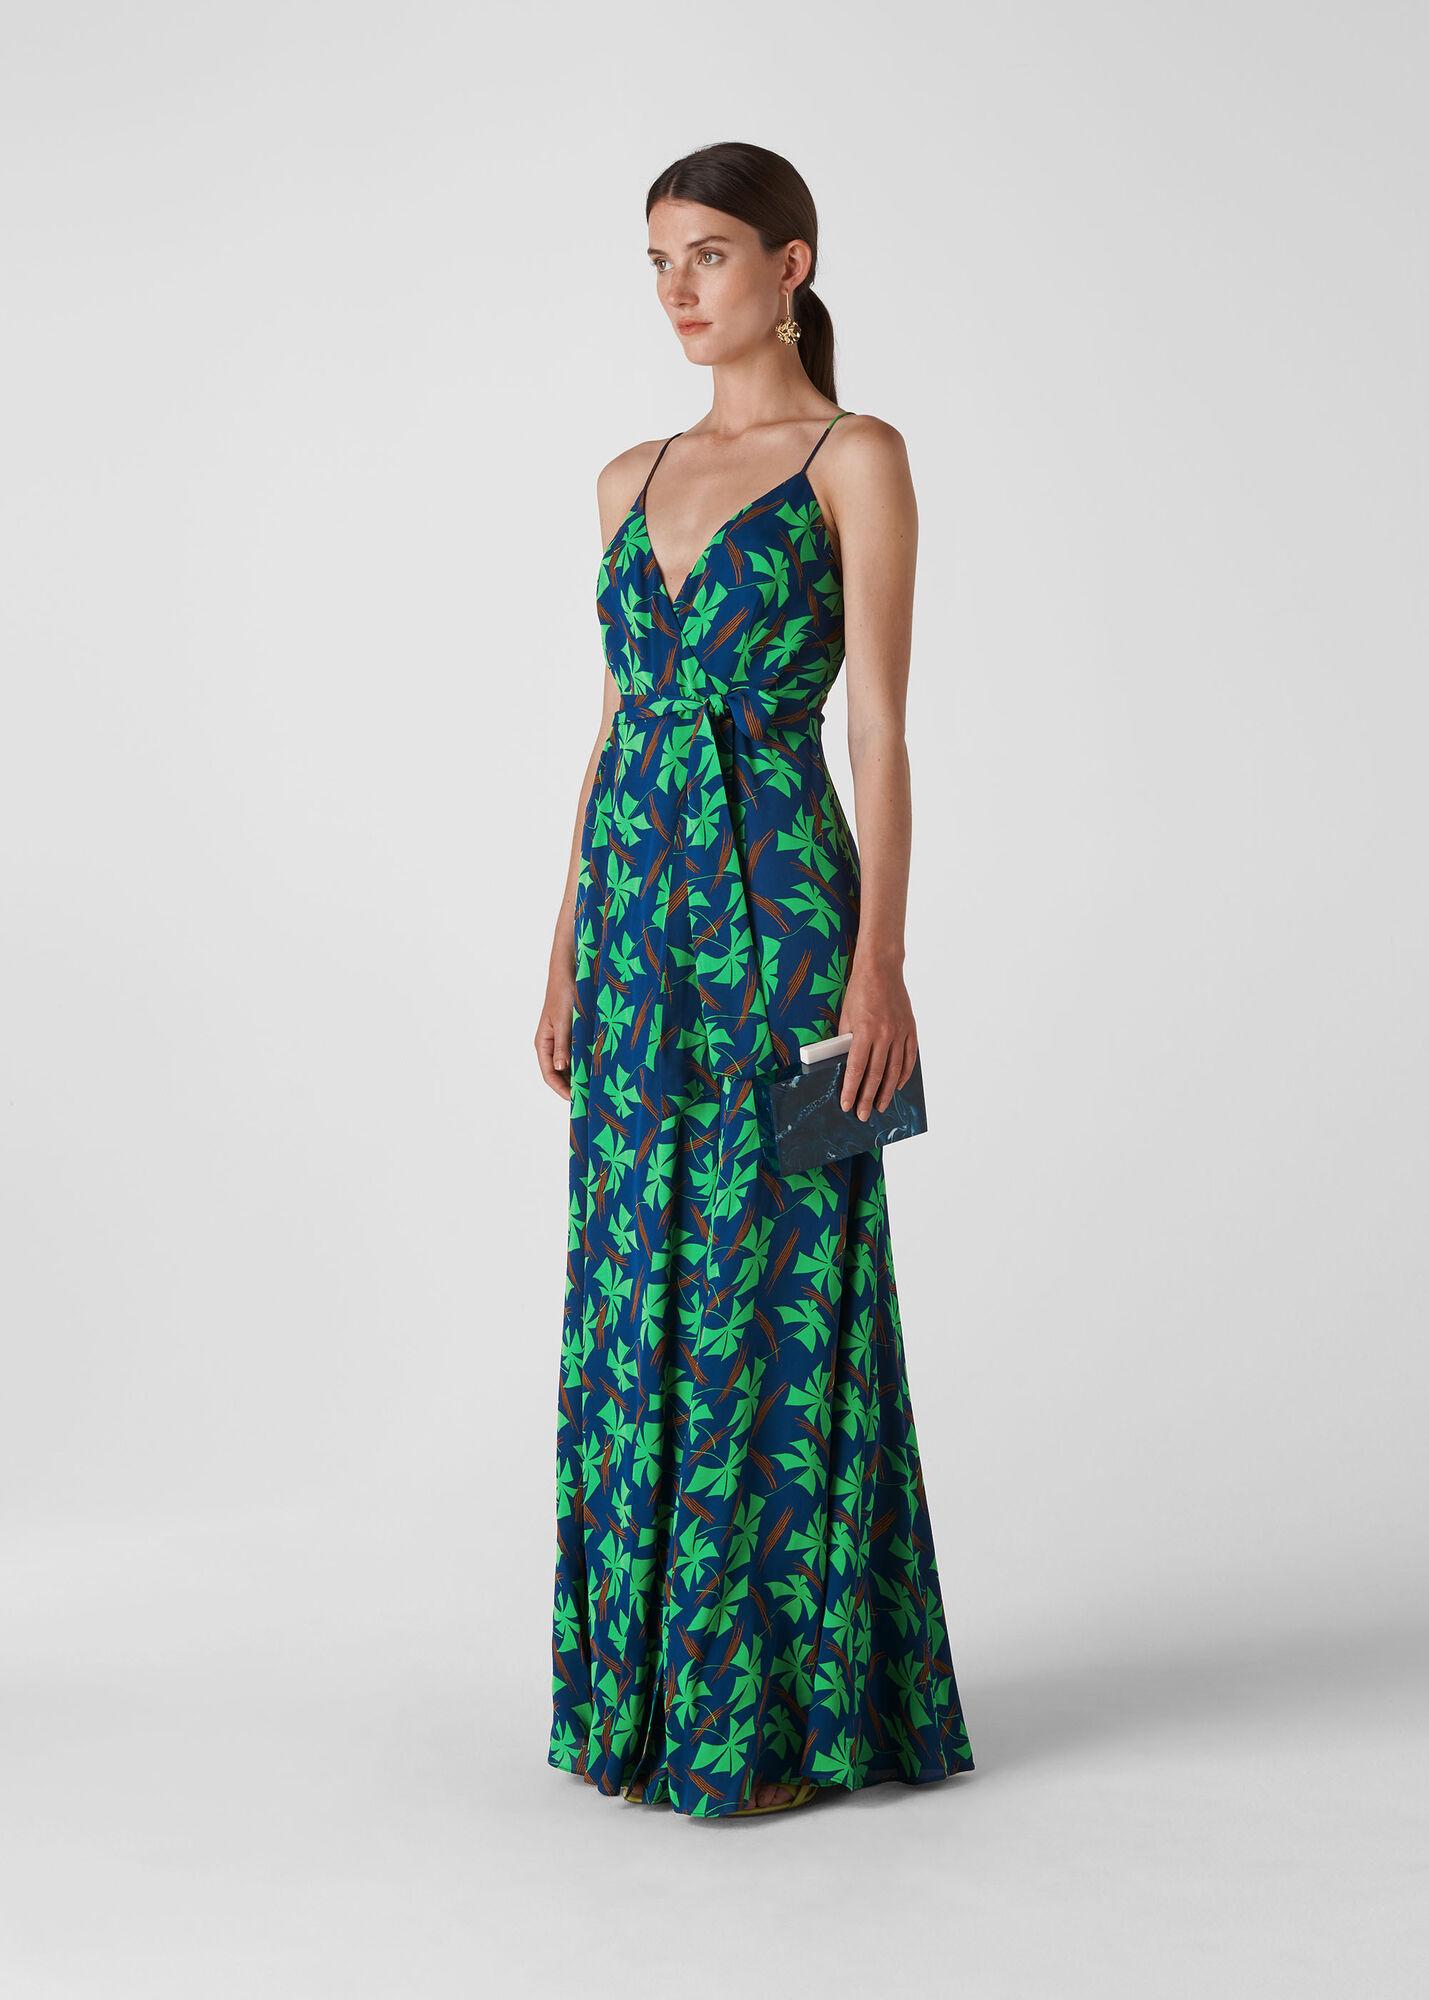 Noa Graphic Clover Maxi Dress